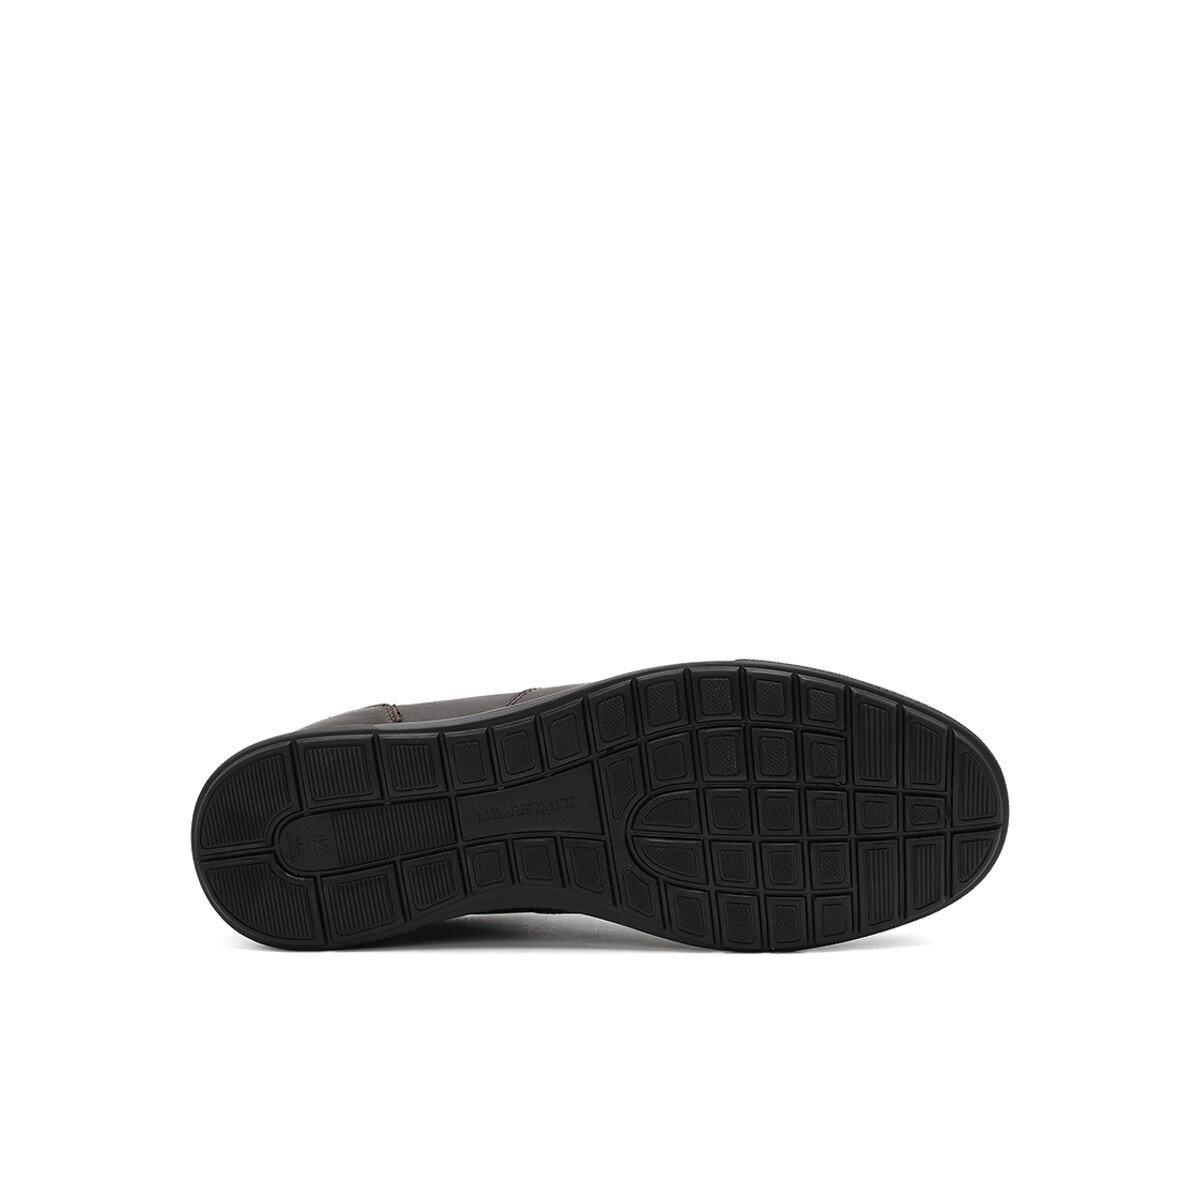 LUCAS Casual shoes Man